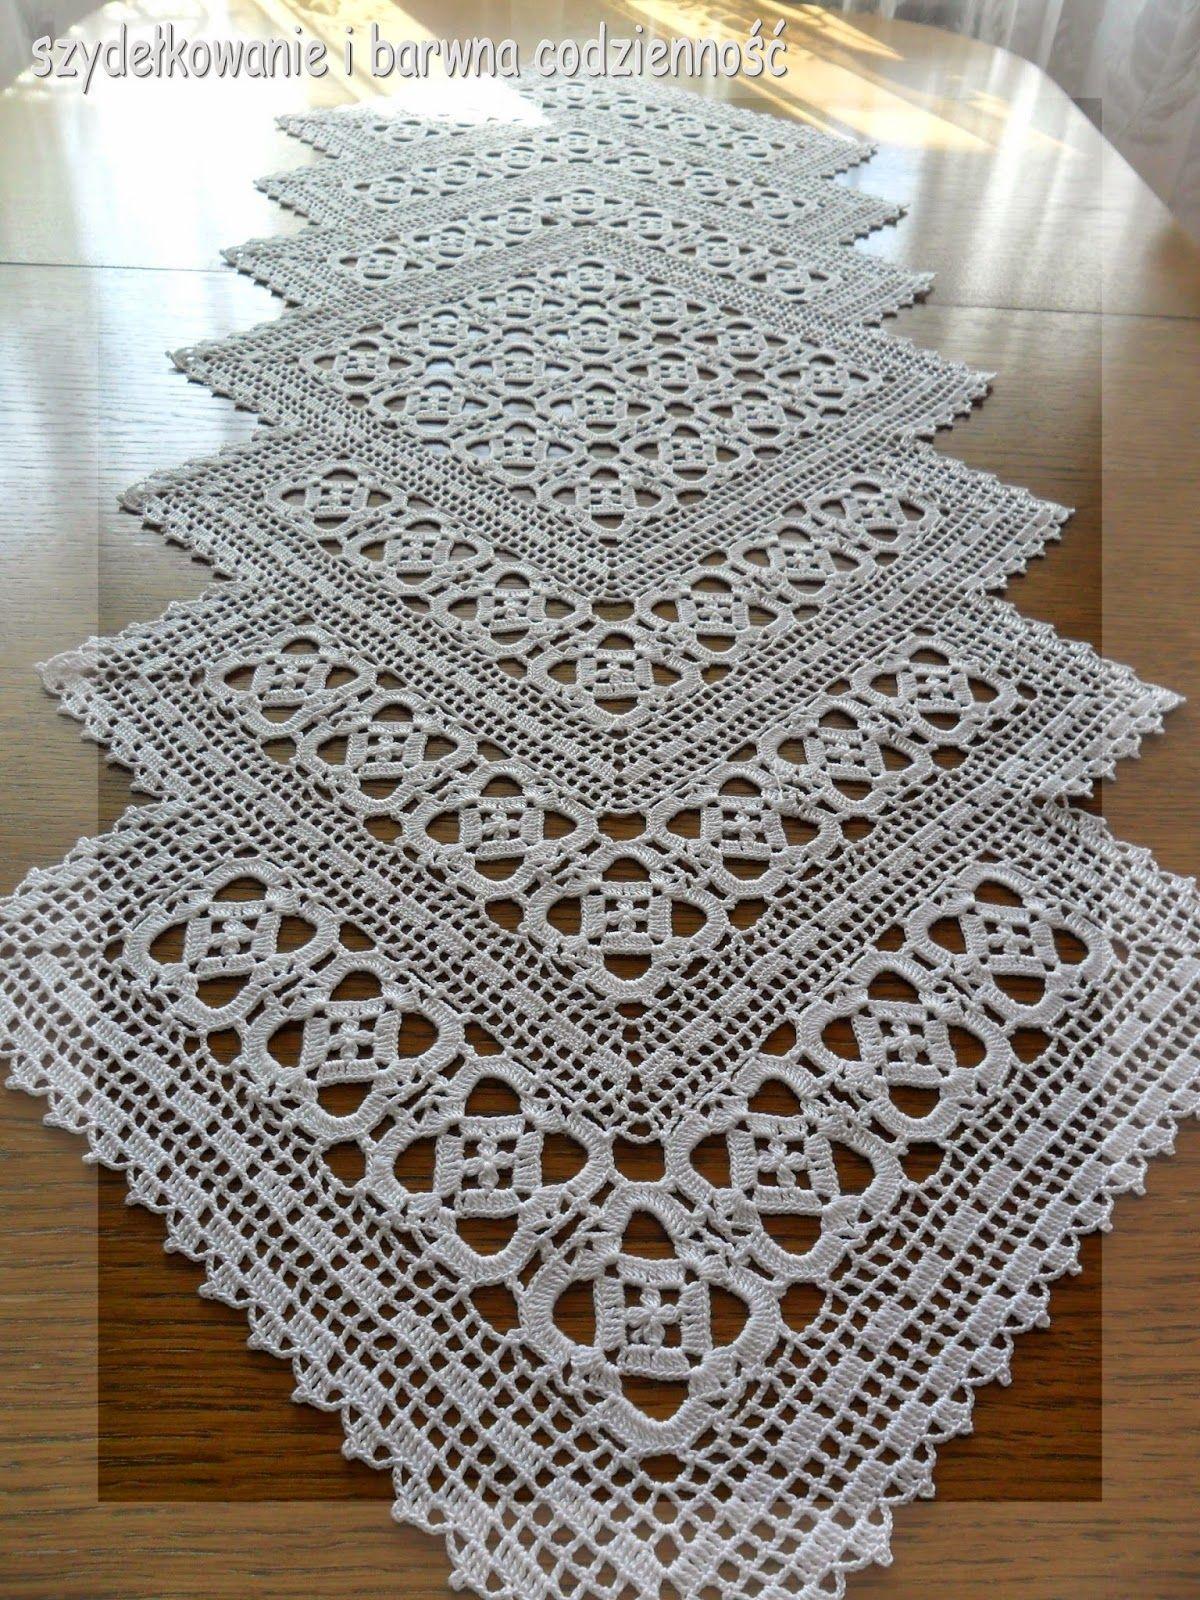 Sam_0649 Jpg 1 200 1 600 Pixeles Crochet Pinterest Caminos De